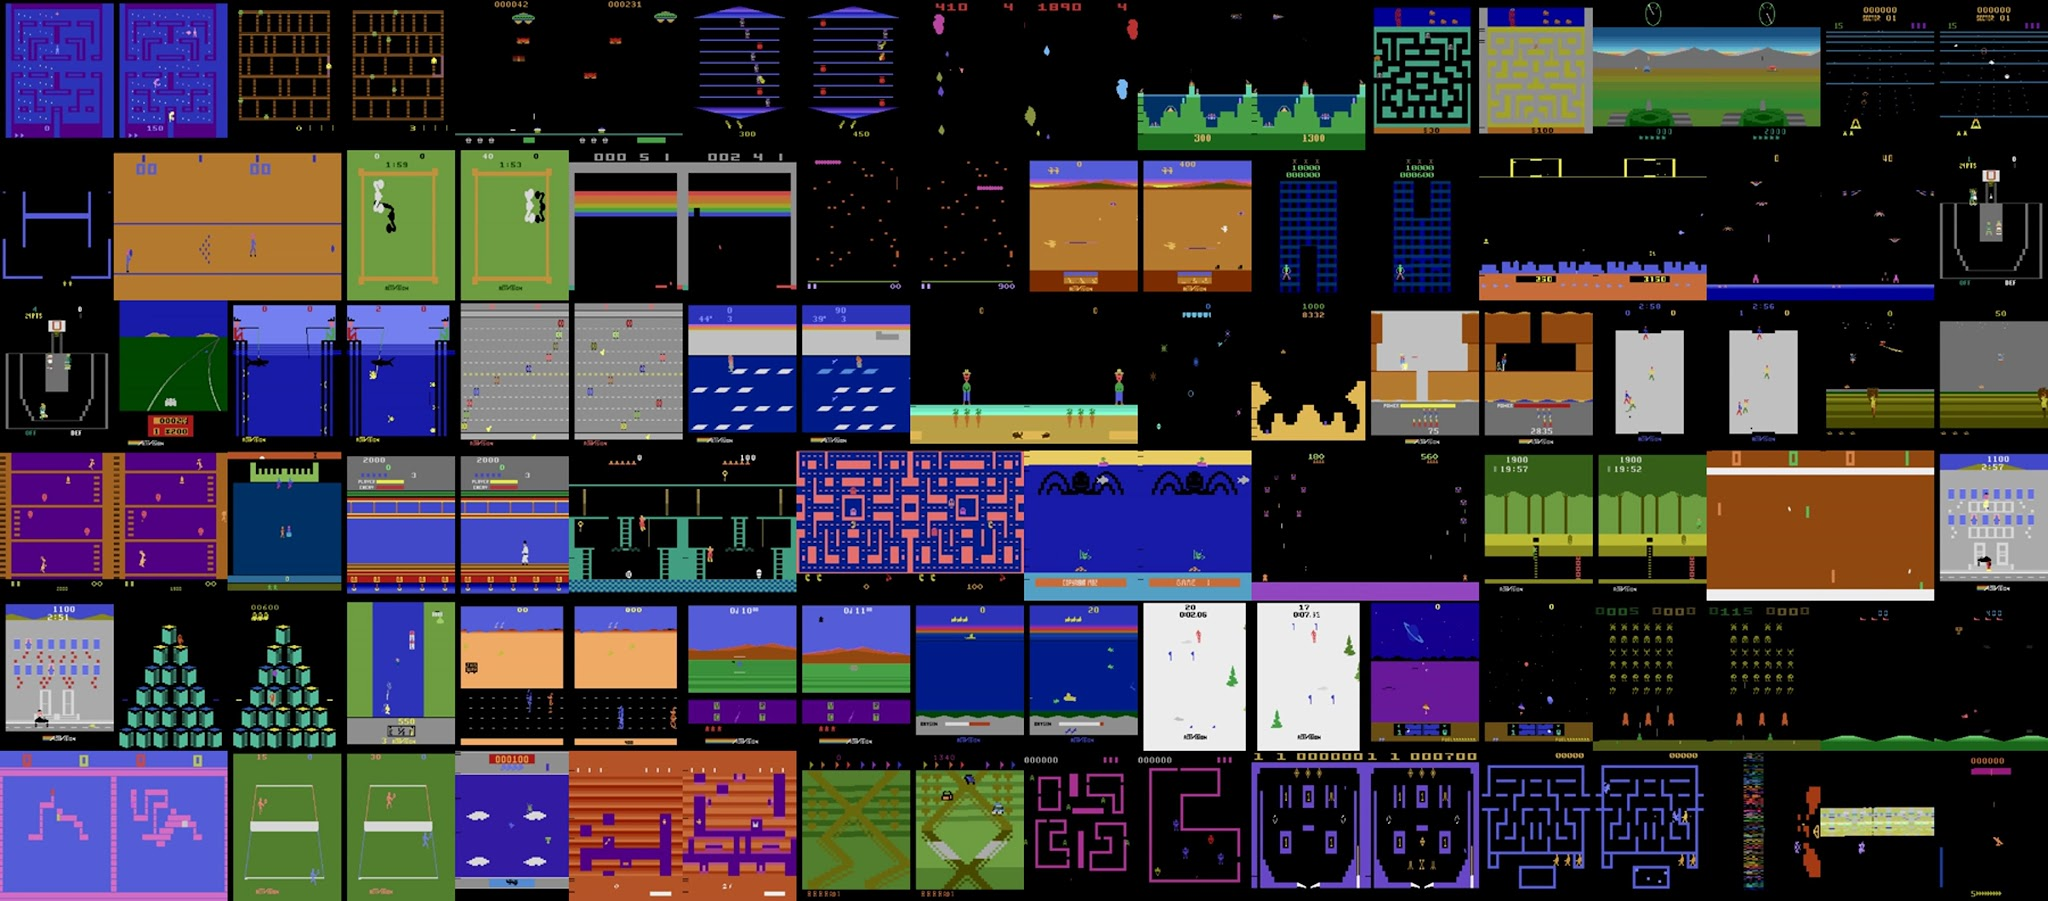 Agent57: Outperforming the human Atari benchmark   DeepMind